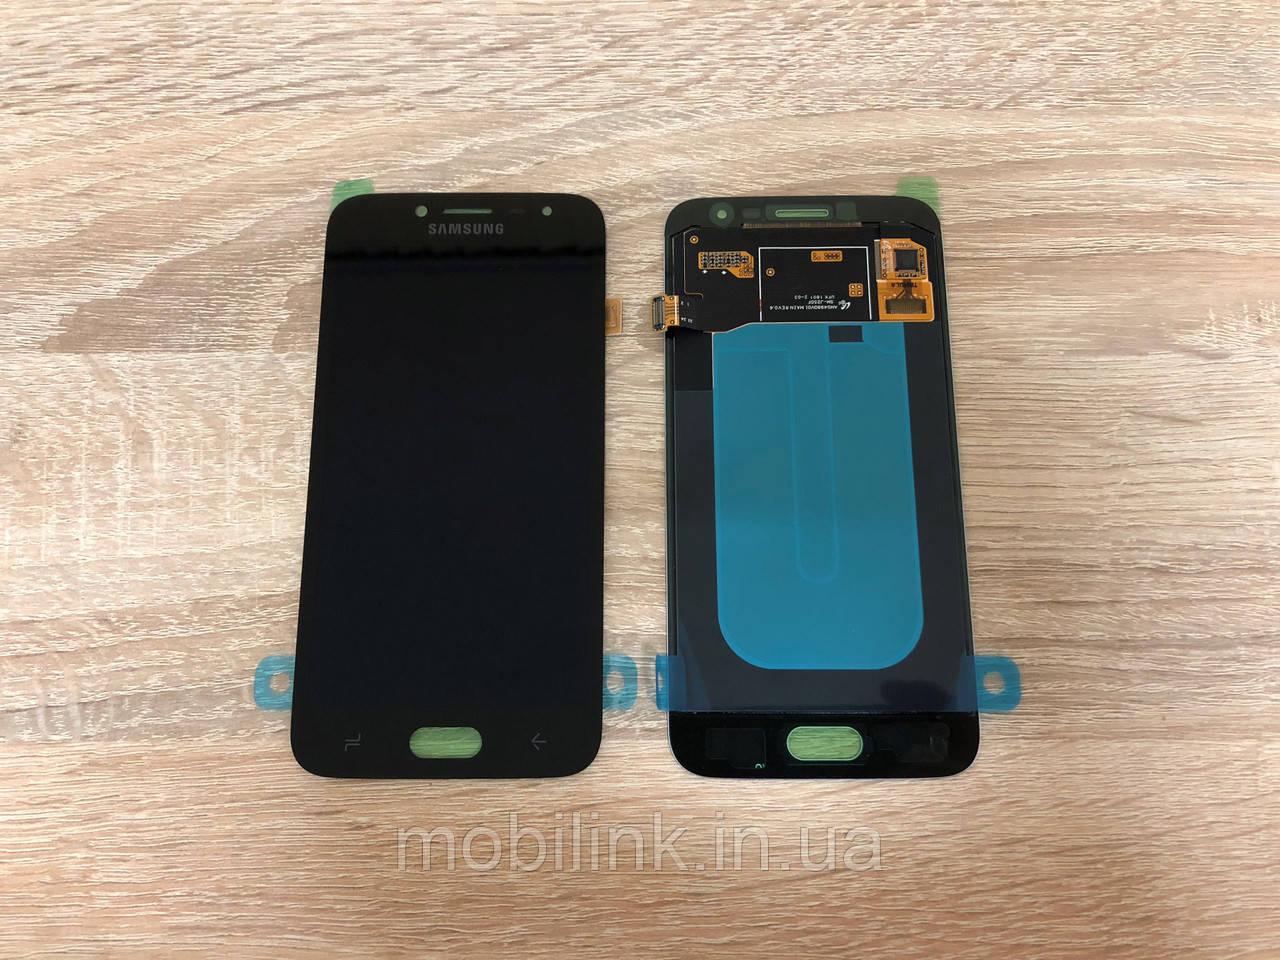 Дисплей на Samsung J250 Galaxy J2(2018) Чёрный(Black), GH97-21339A, Super AMOLED!